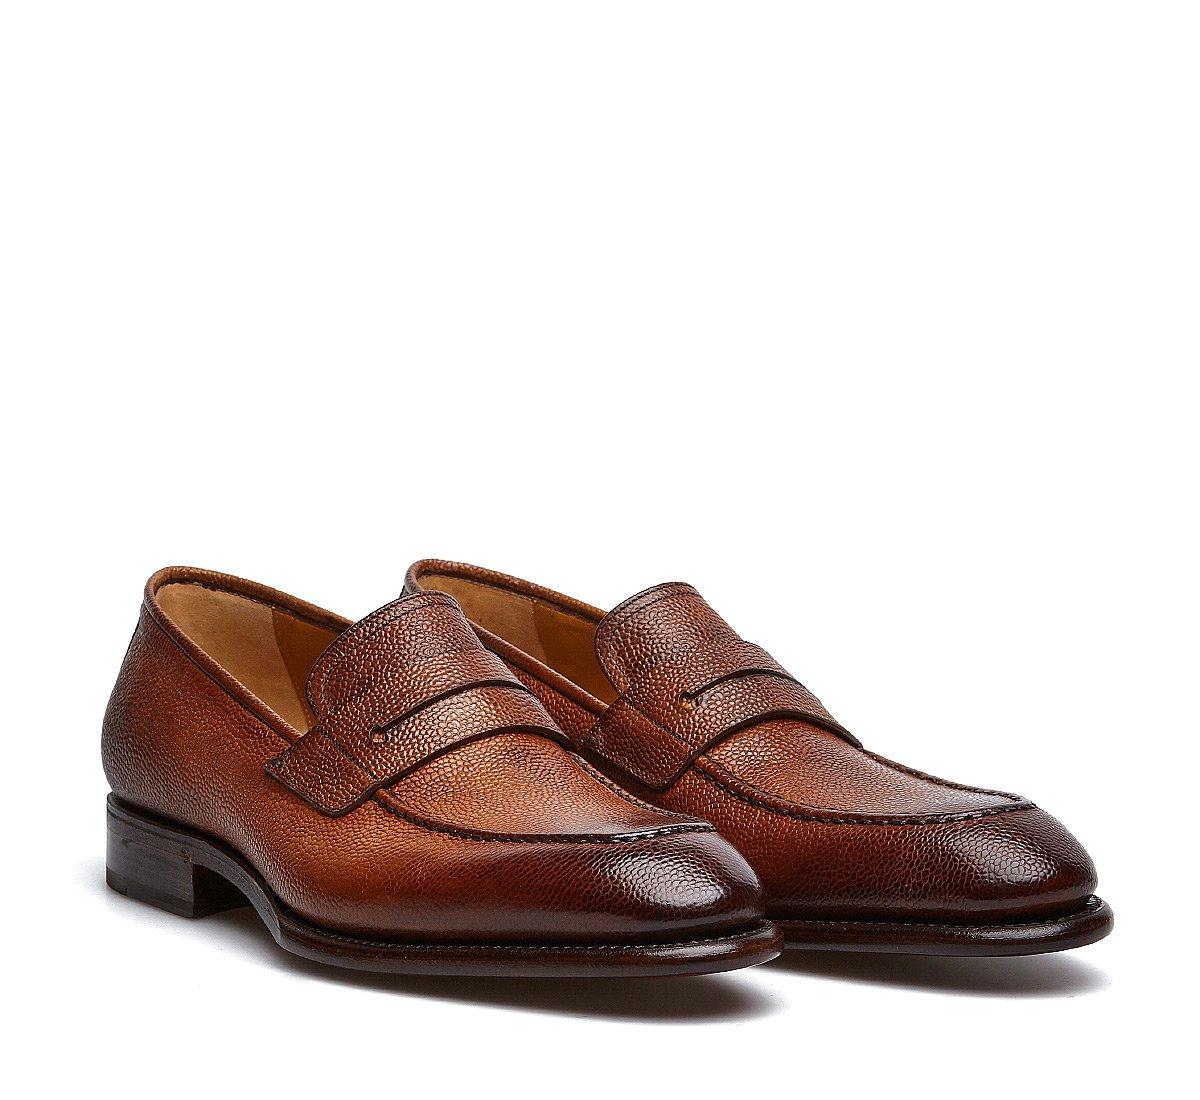 Fabi Flex Goodyear moccasins in exquisite calfskin